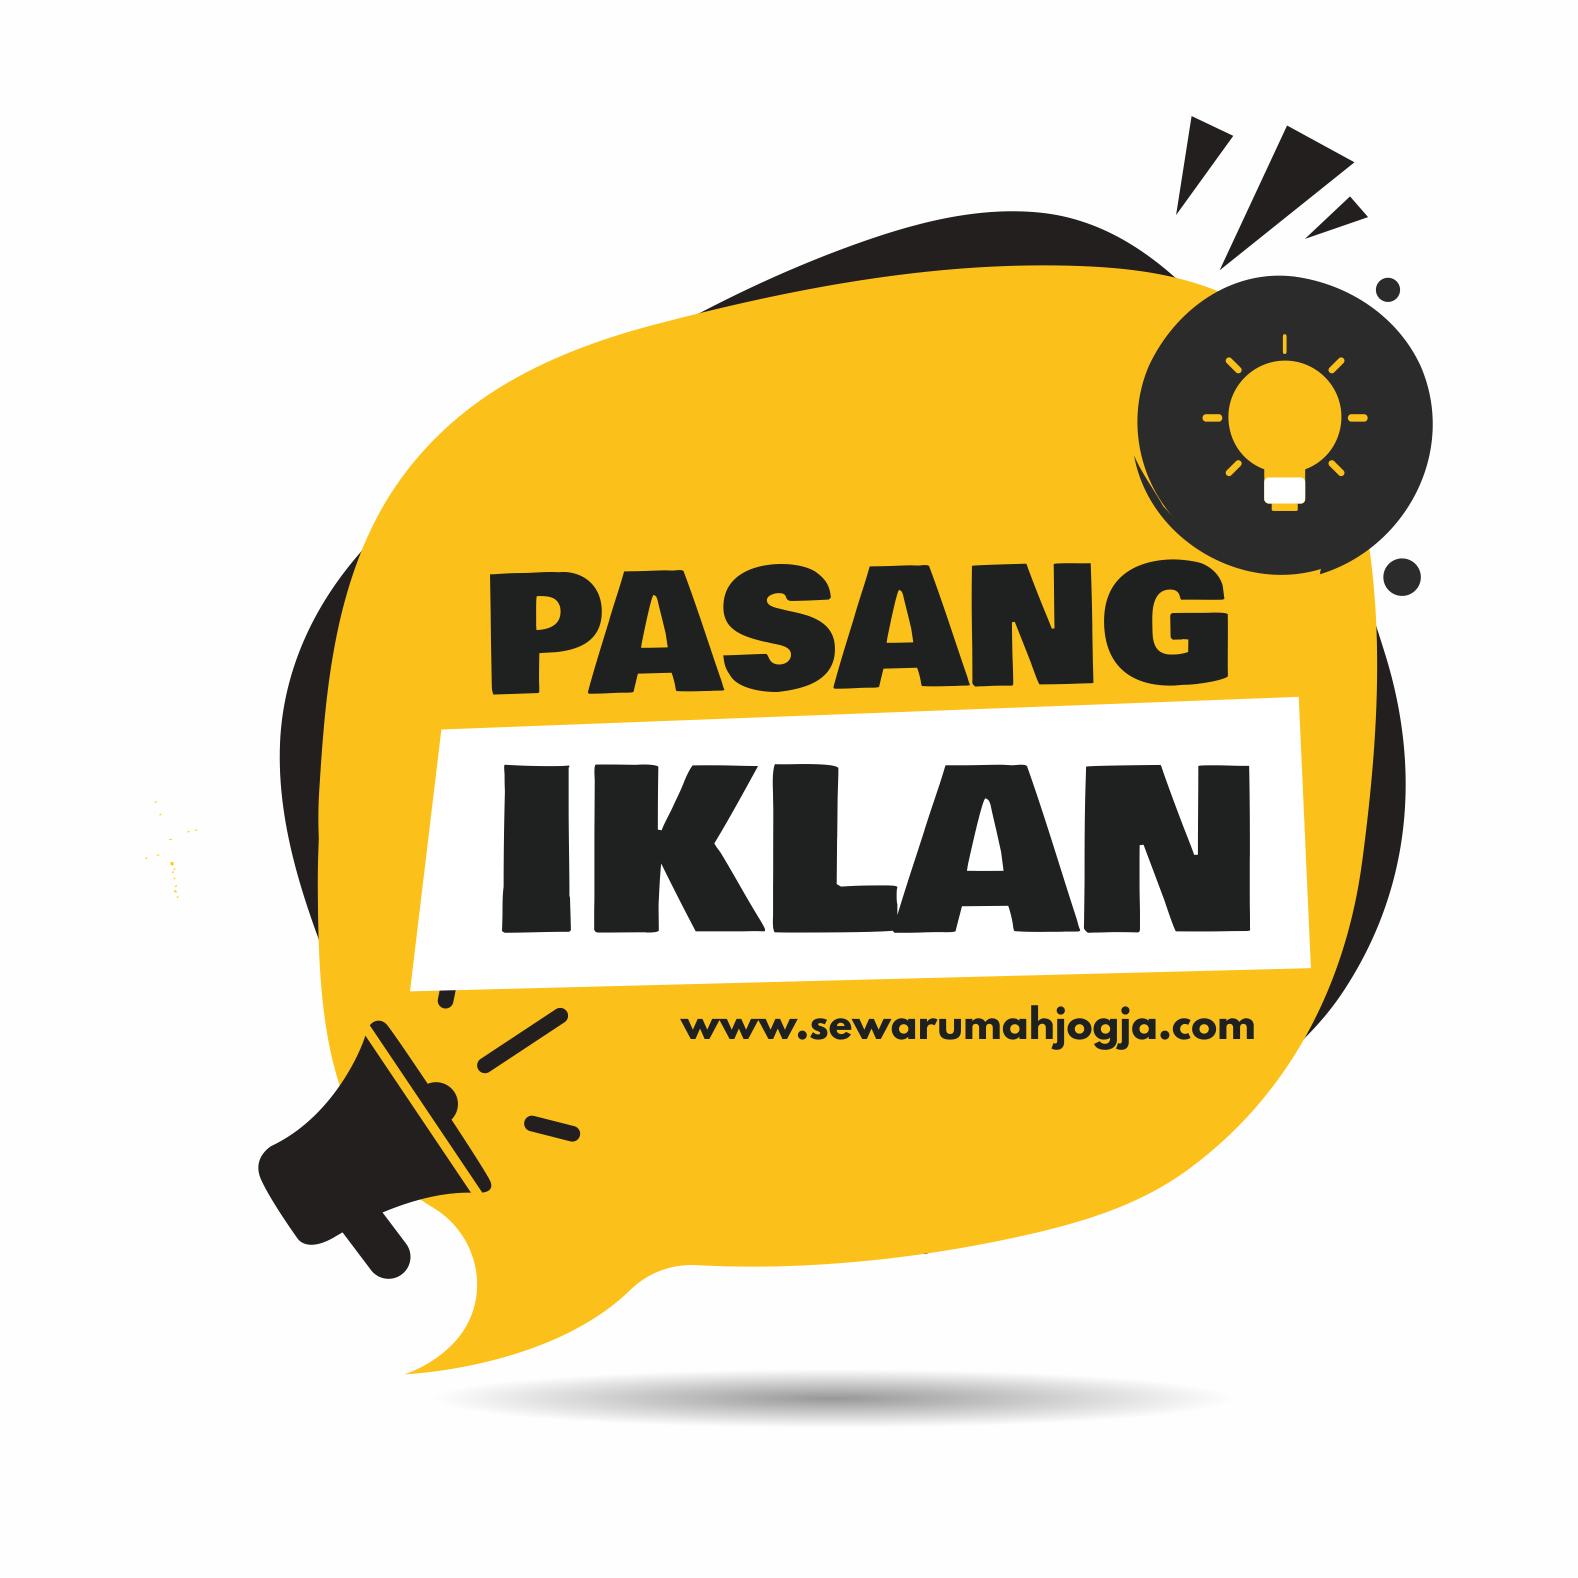 Pasang Iklan Sewa Rumah Liburan Di Jogja Harian Mingguan Bulanan